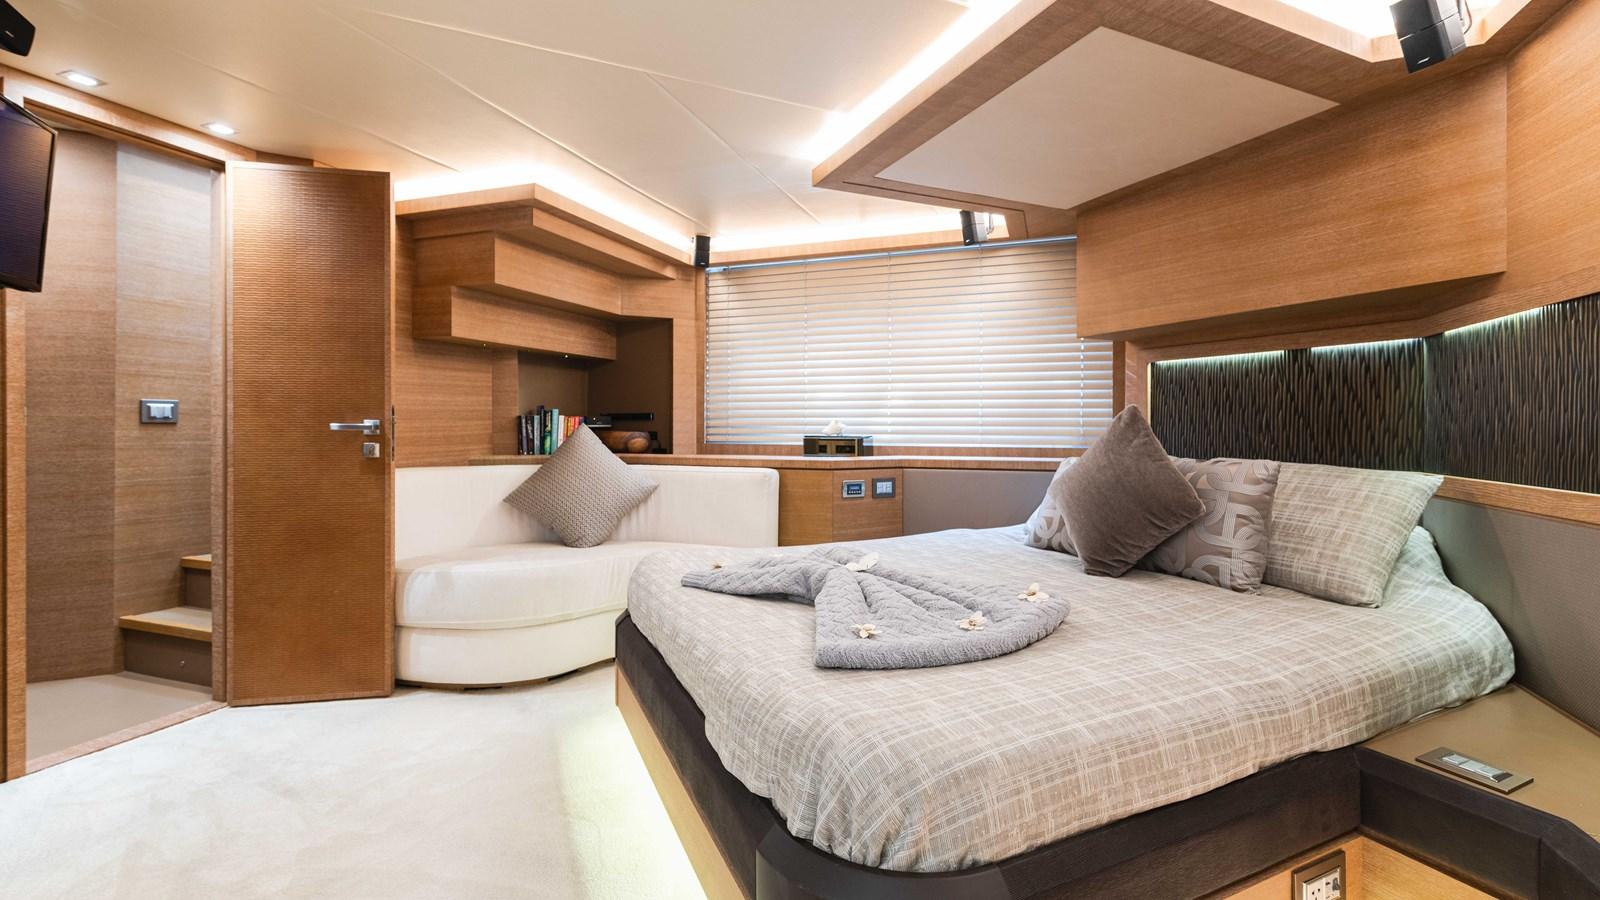 76 Monte Carlo (23 of 127) 2014 MONTE CARLO YACHTS Motoryacht Motor Yacht 2825169